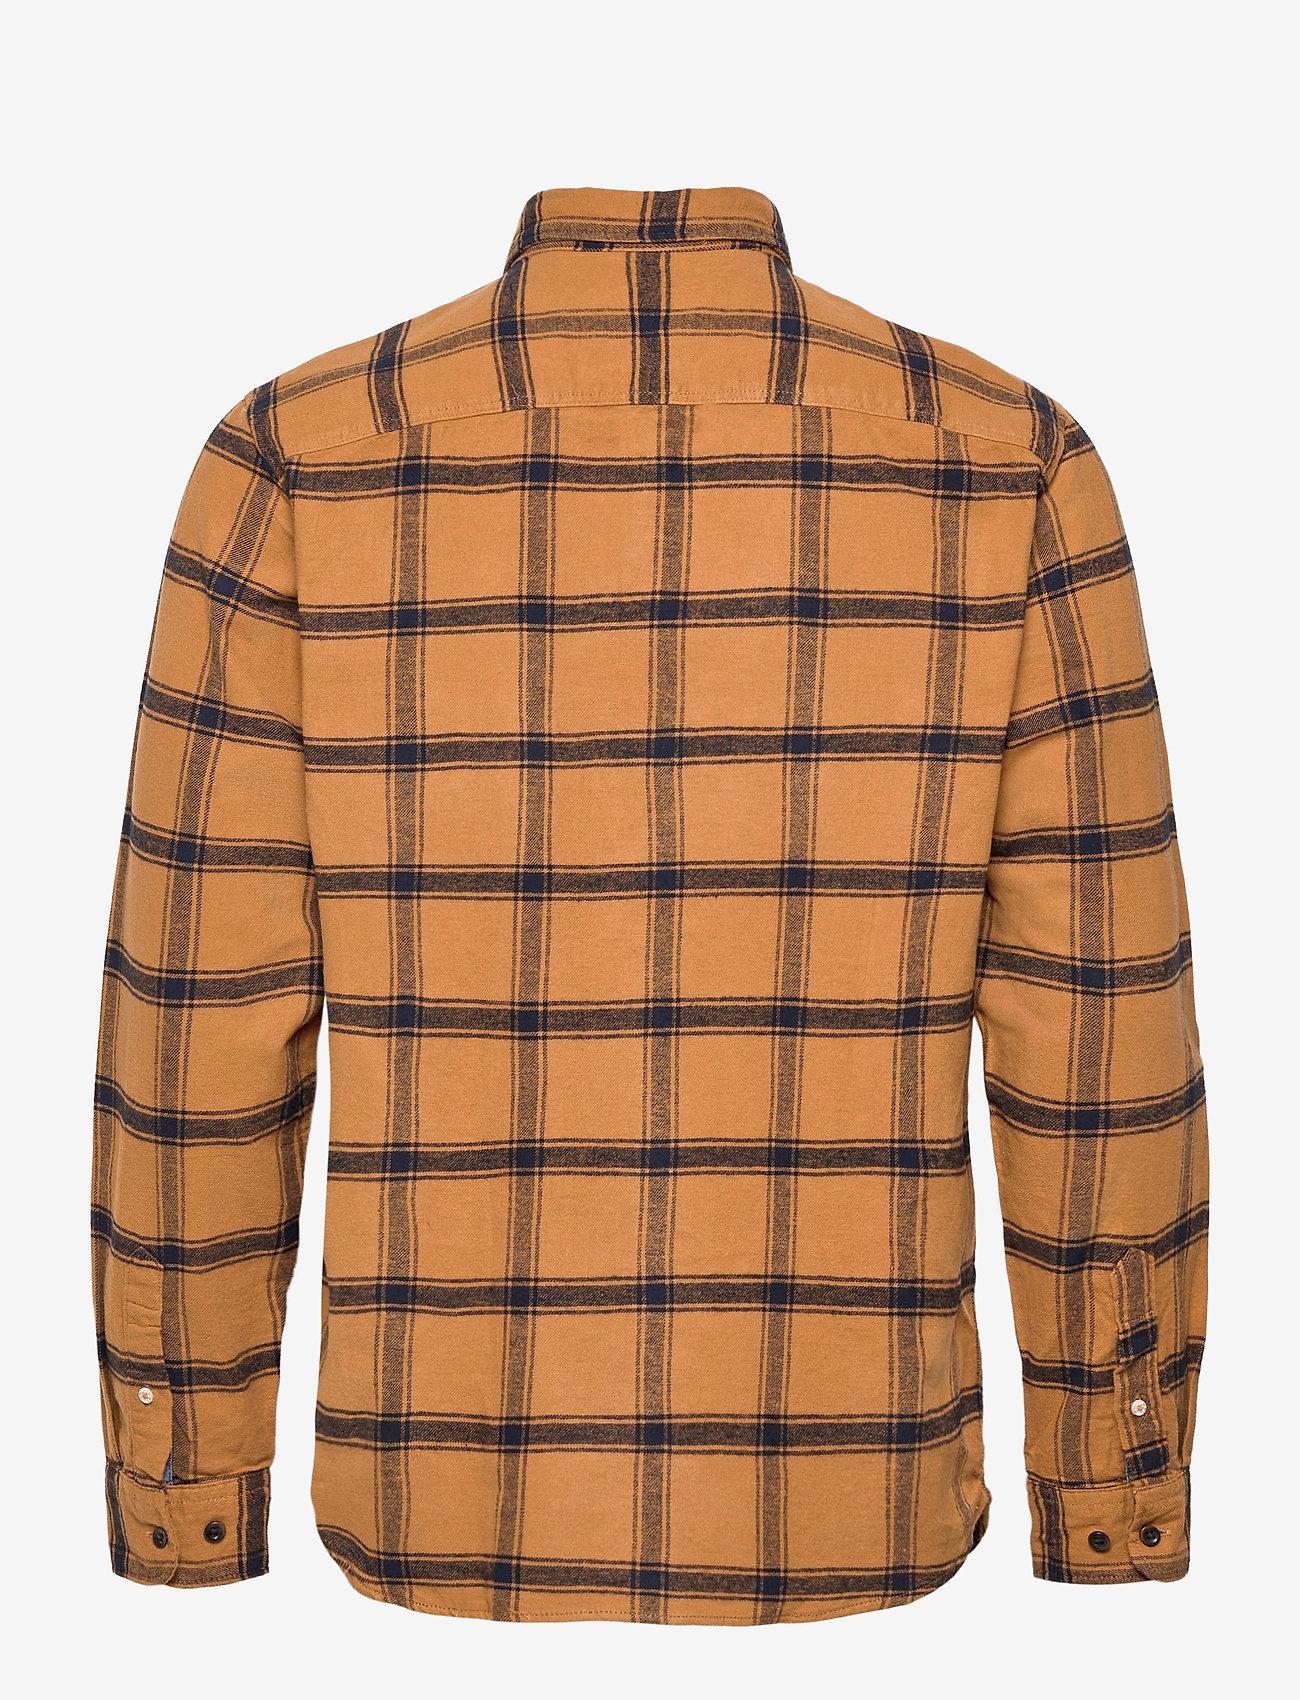 Jack & Jones - JORJAN SHIRT LS - rutiga skjortor - rubber - 1